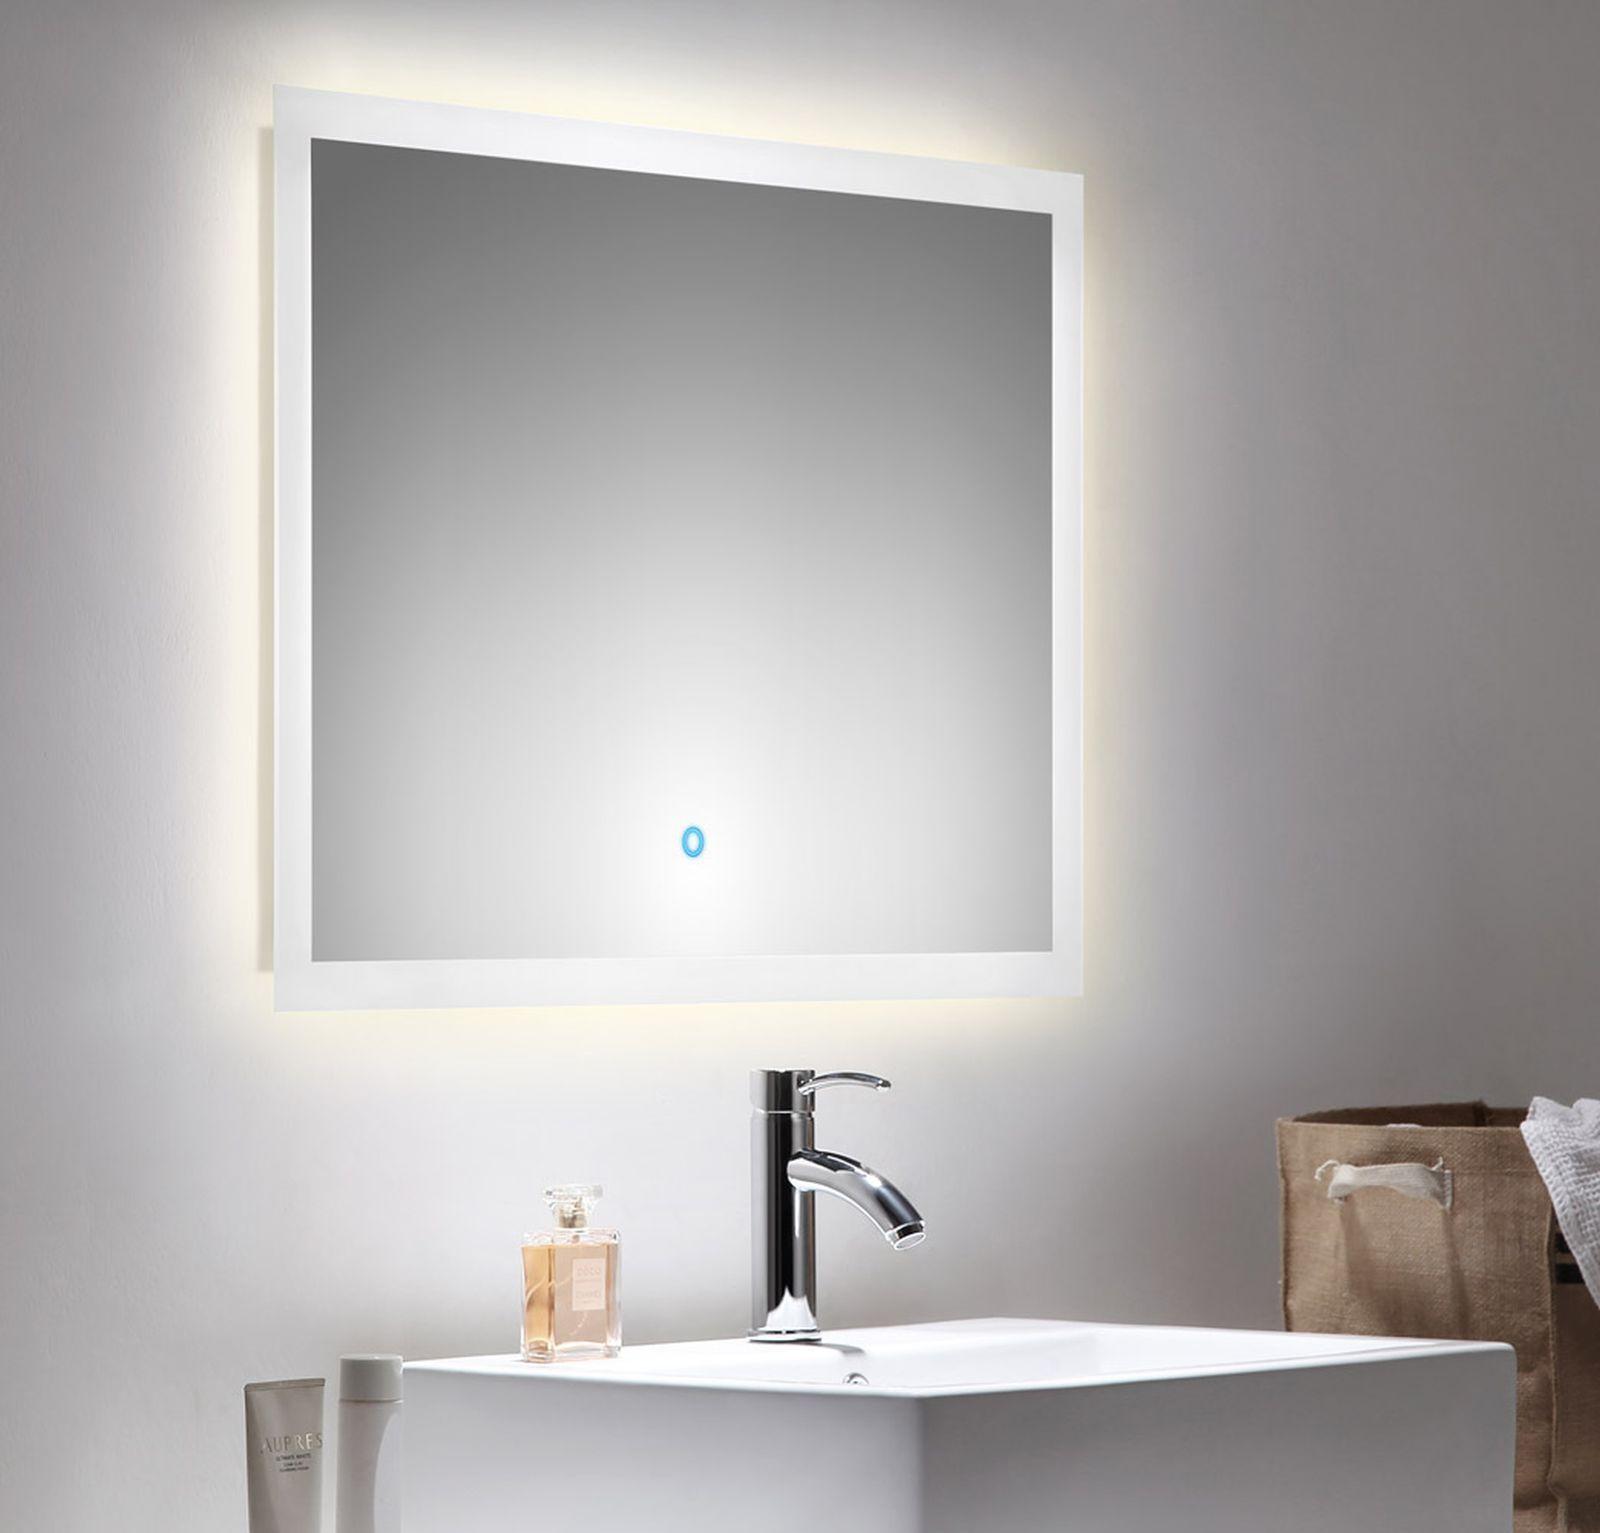 LED Badezimmer Wand Spiegel EMOTION 80 x 60 cm Touch Bedienung 34 W ...